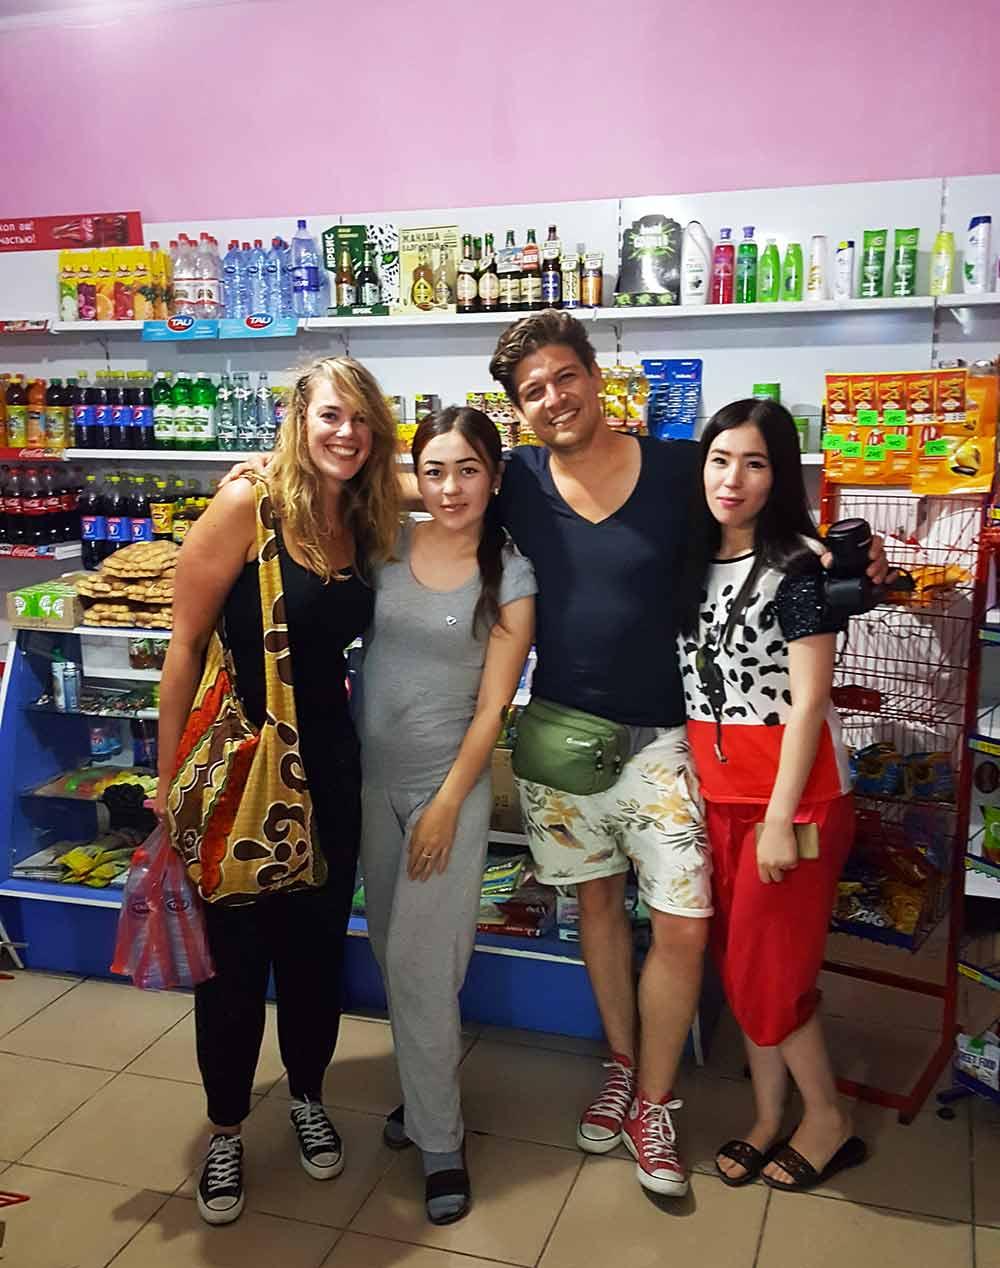 Shymkent-vrienden